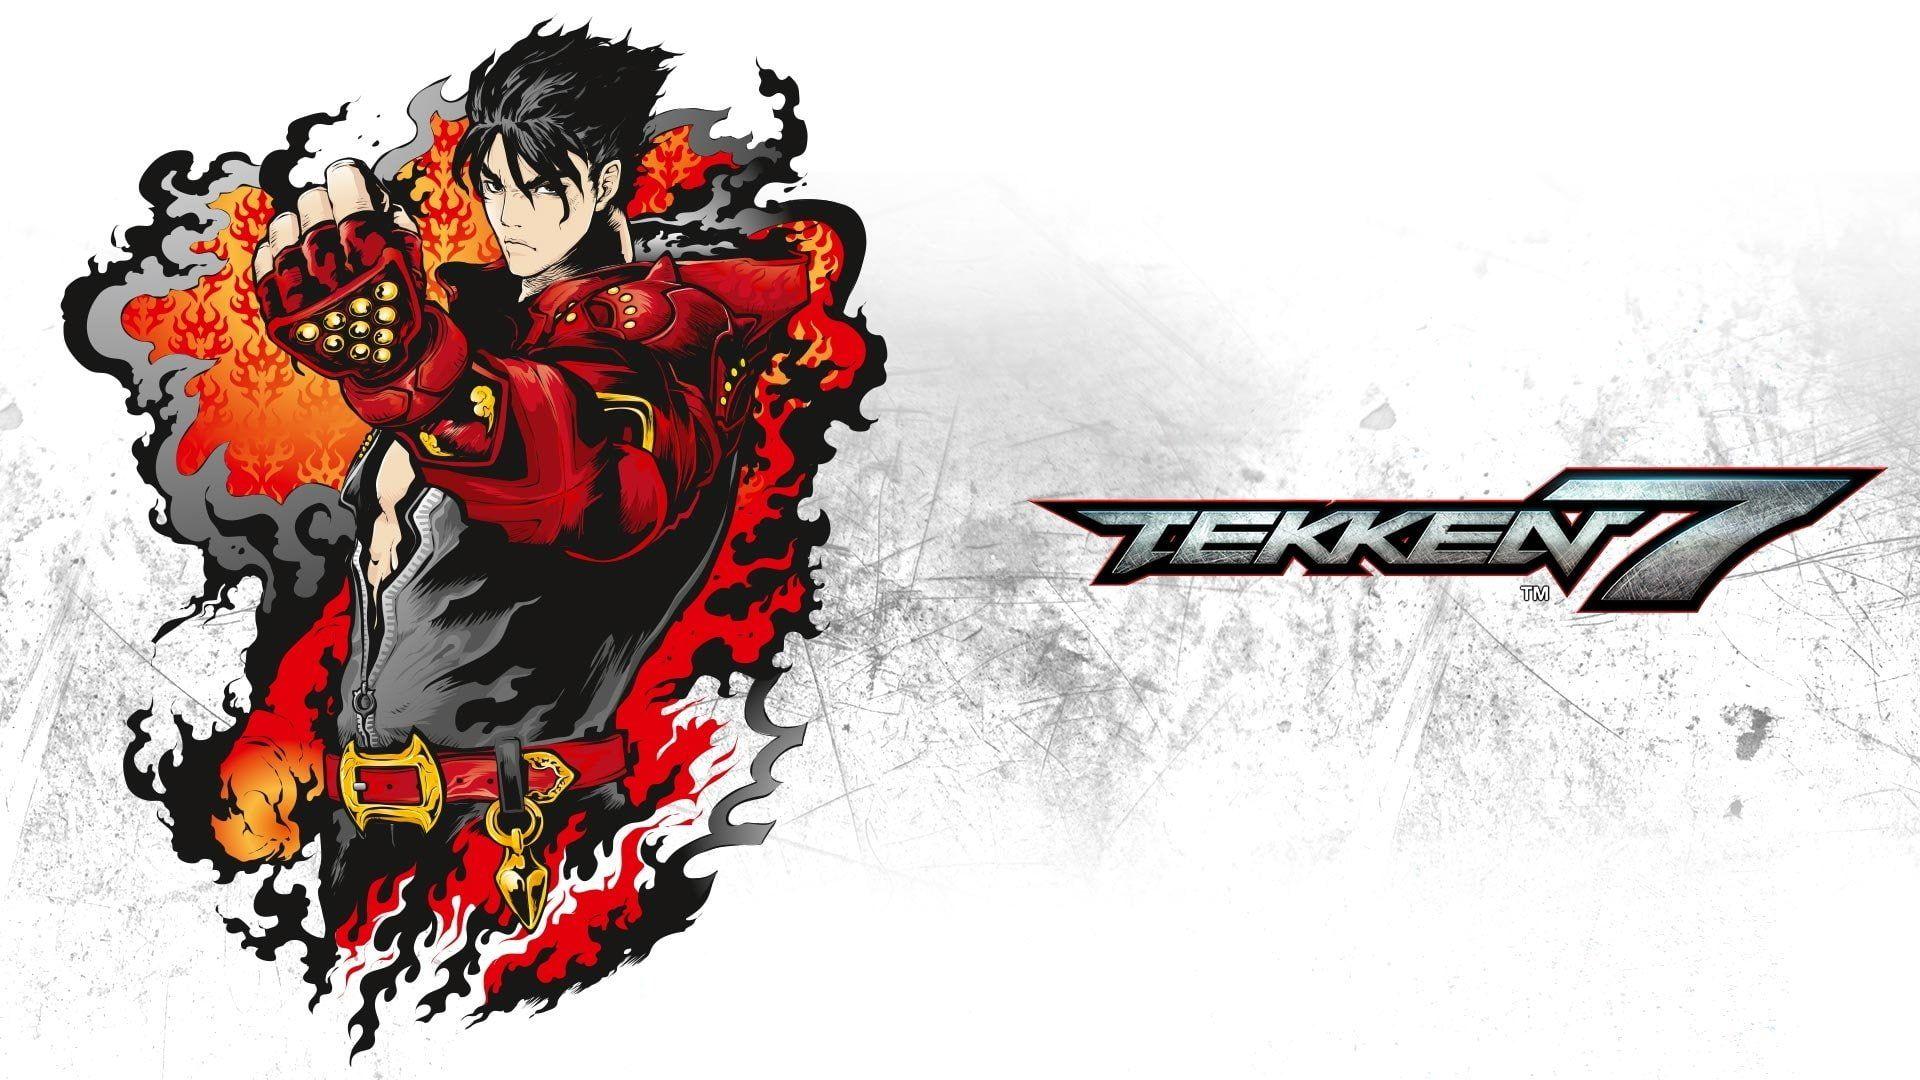 Tekken Tekken 7 Jin Kazama 1080p Wallpaper Hdwallpaper Desktop In 2021 Jin Kazama Tekken 7 Hd Wallpaper